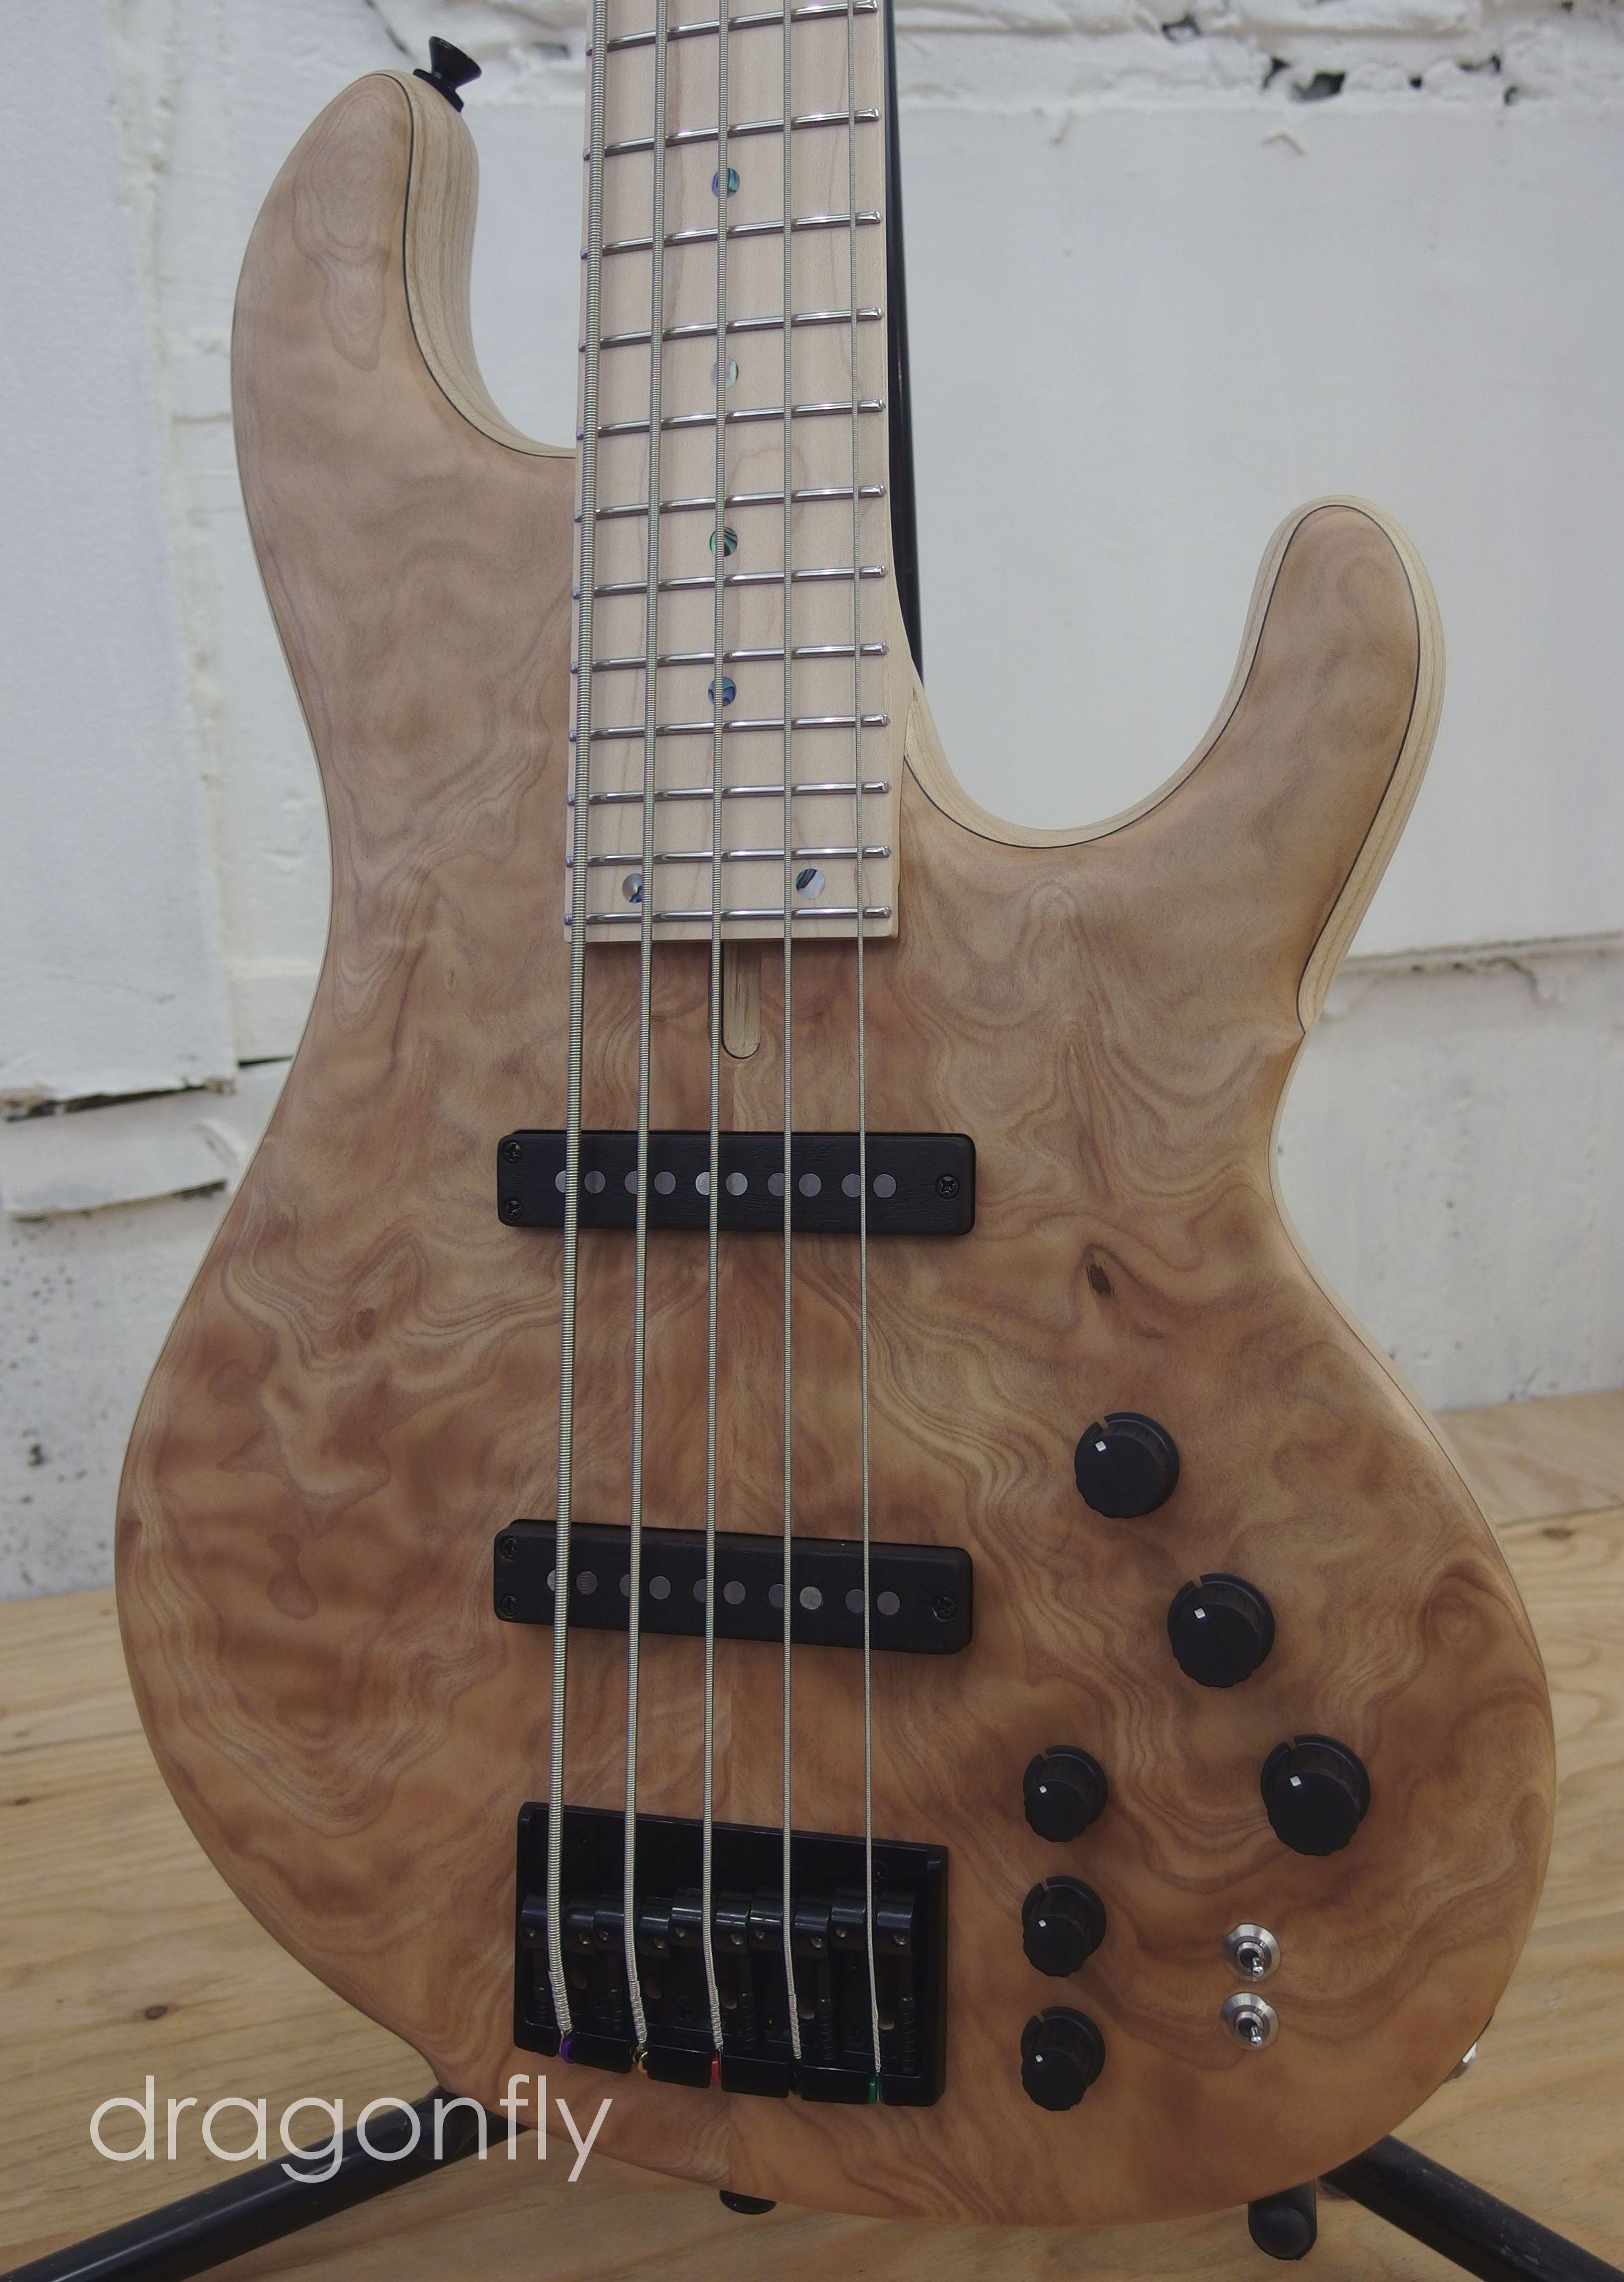 dragonfly Bass Guitar CS-5 CUSTOM   Yoshino-sugi top